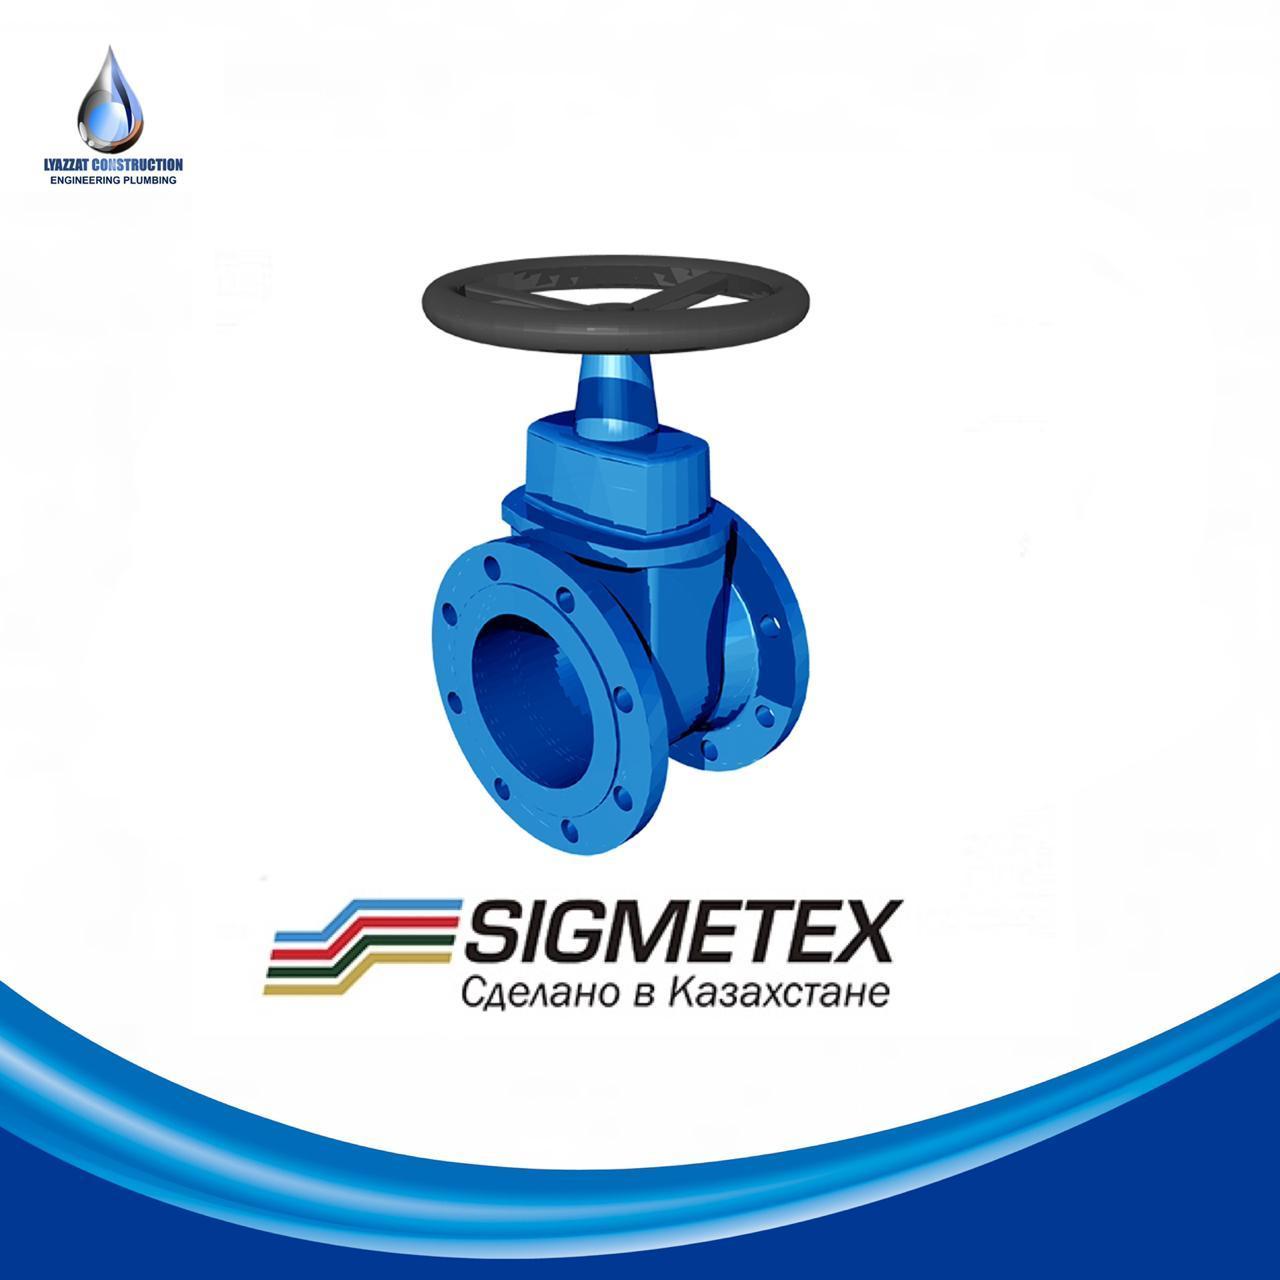 Задвижка Sigmetex DN 450 (Сигметэкс)